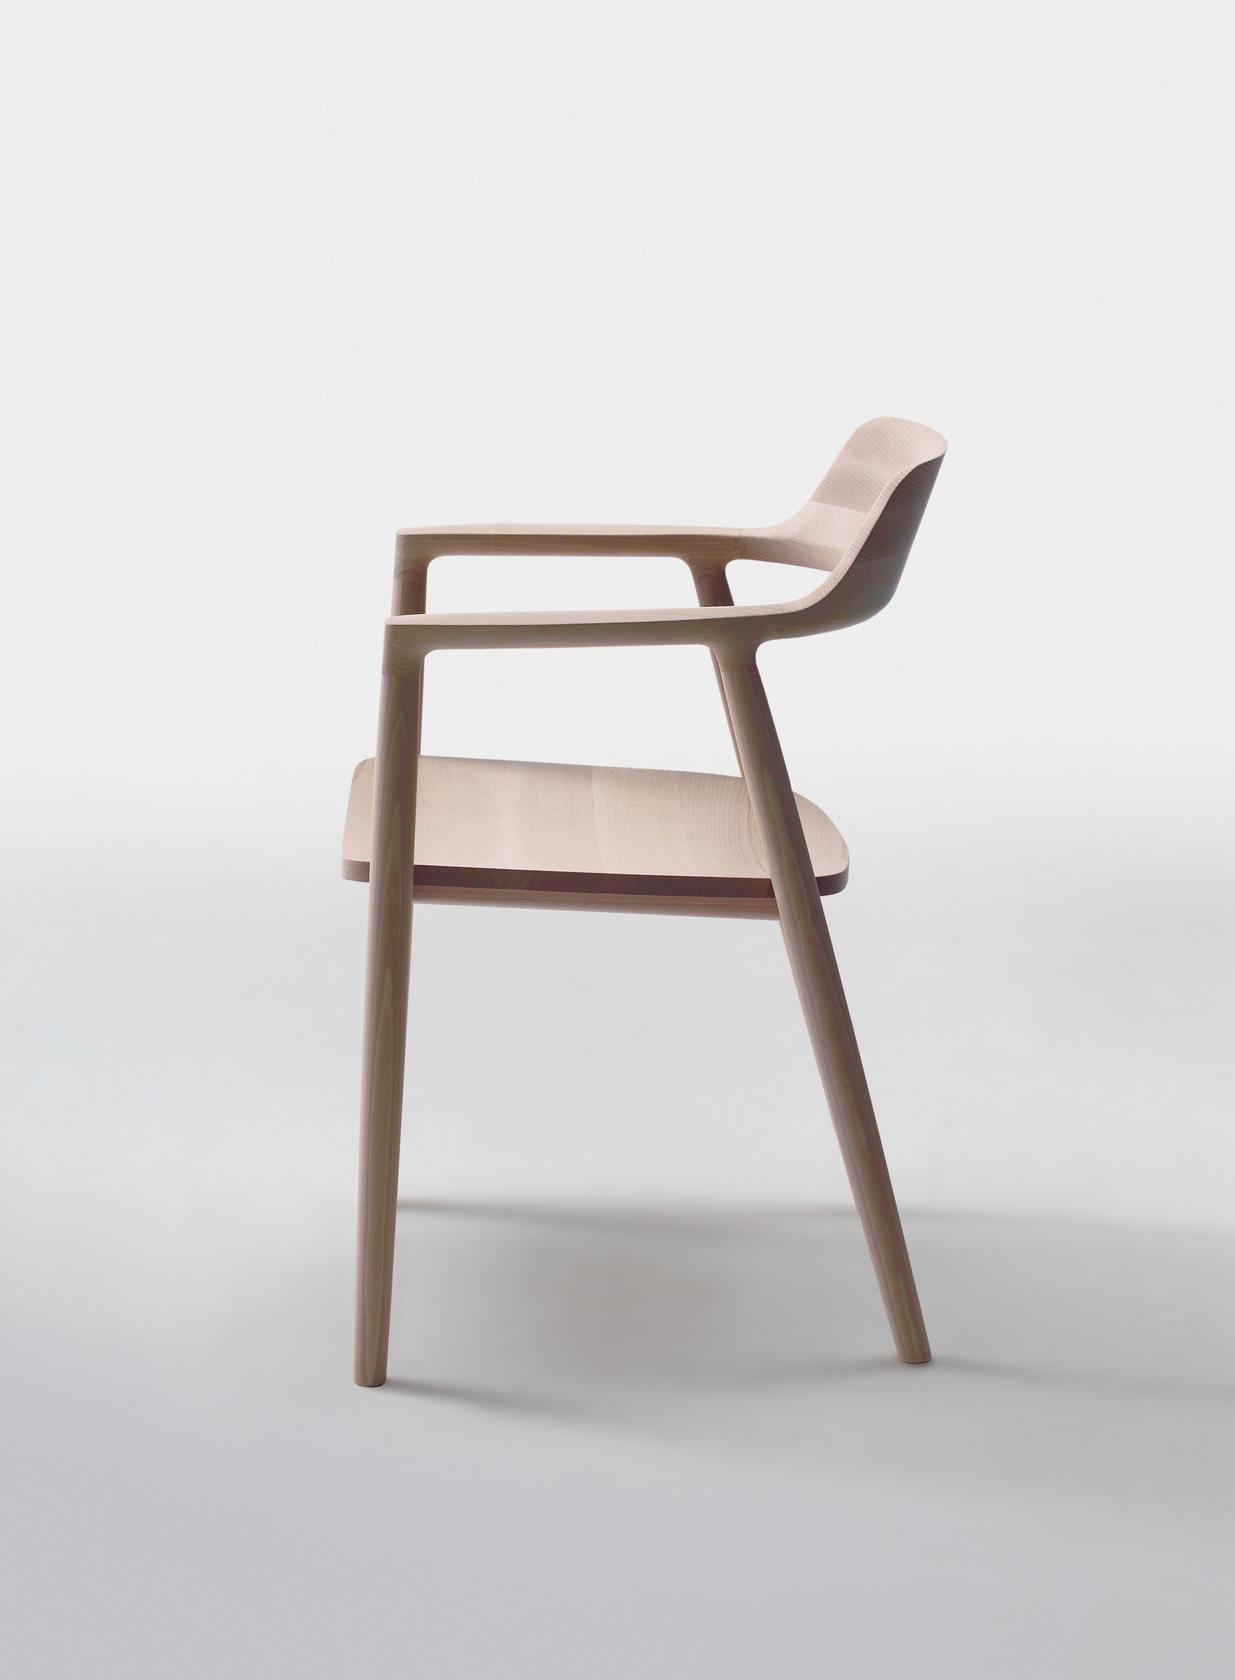 Designer Naoto Fukasawa S Object Lesson On The Beauty Of